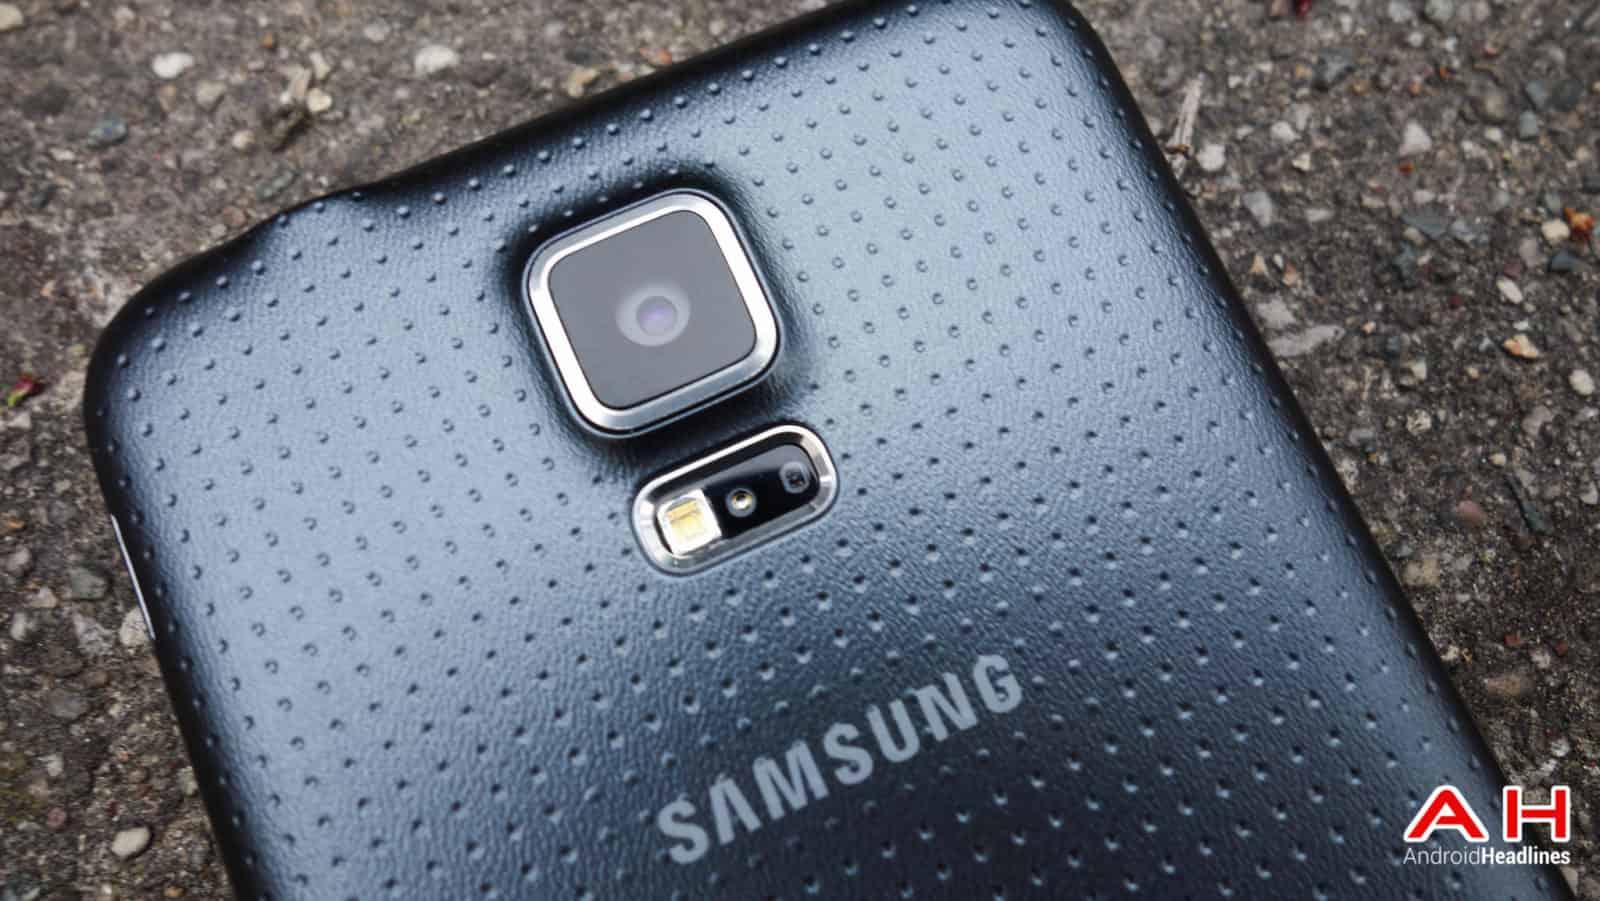 Samsung-galaxy-s5-ah-27